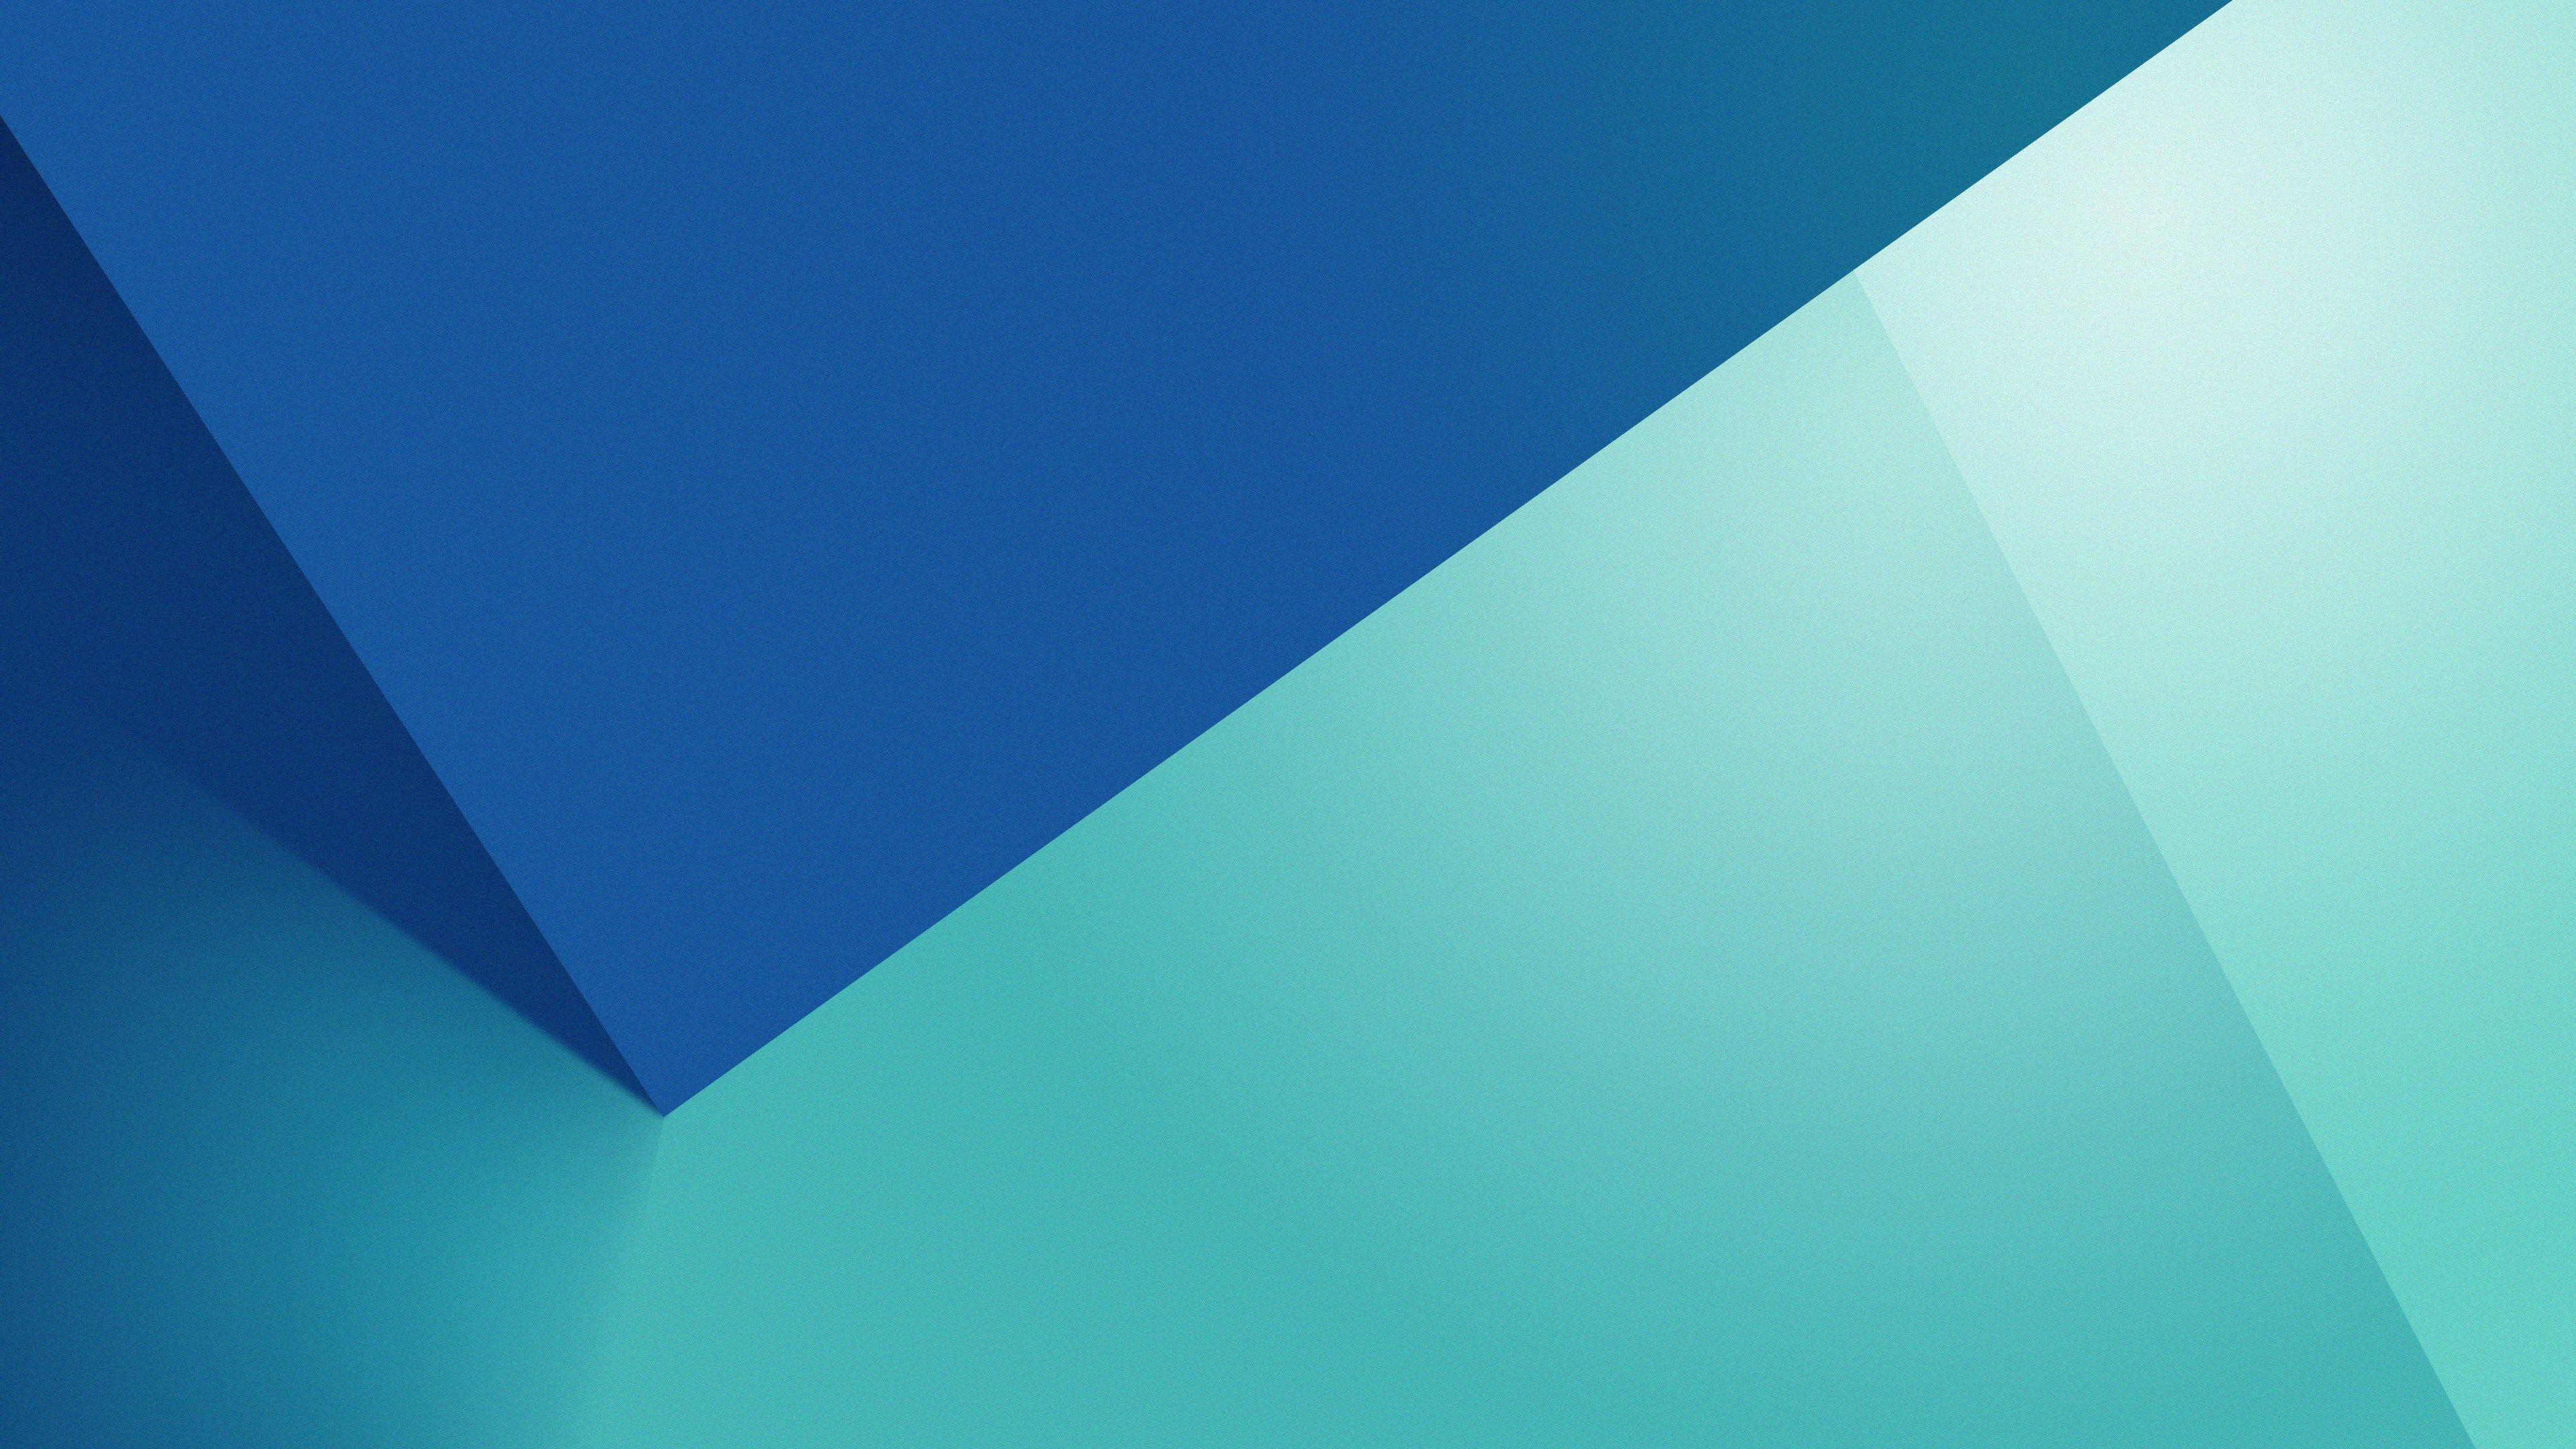 4k Design Wallpapers Top Free 4k Design Backgrounds